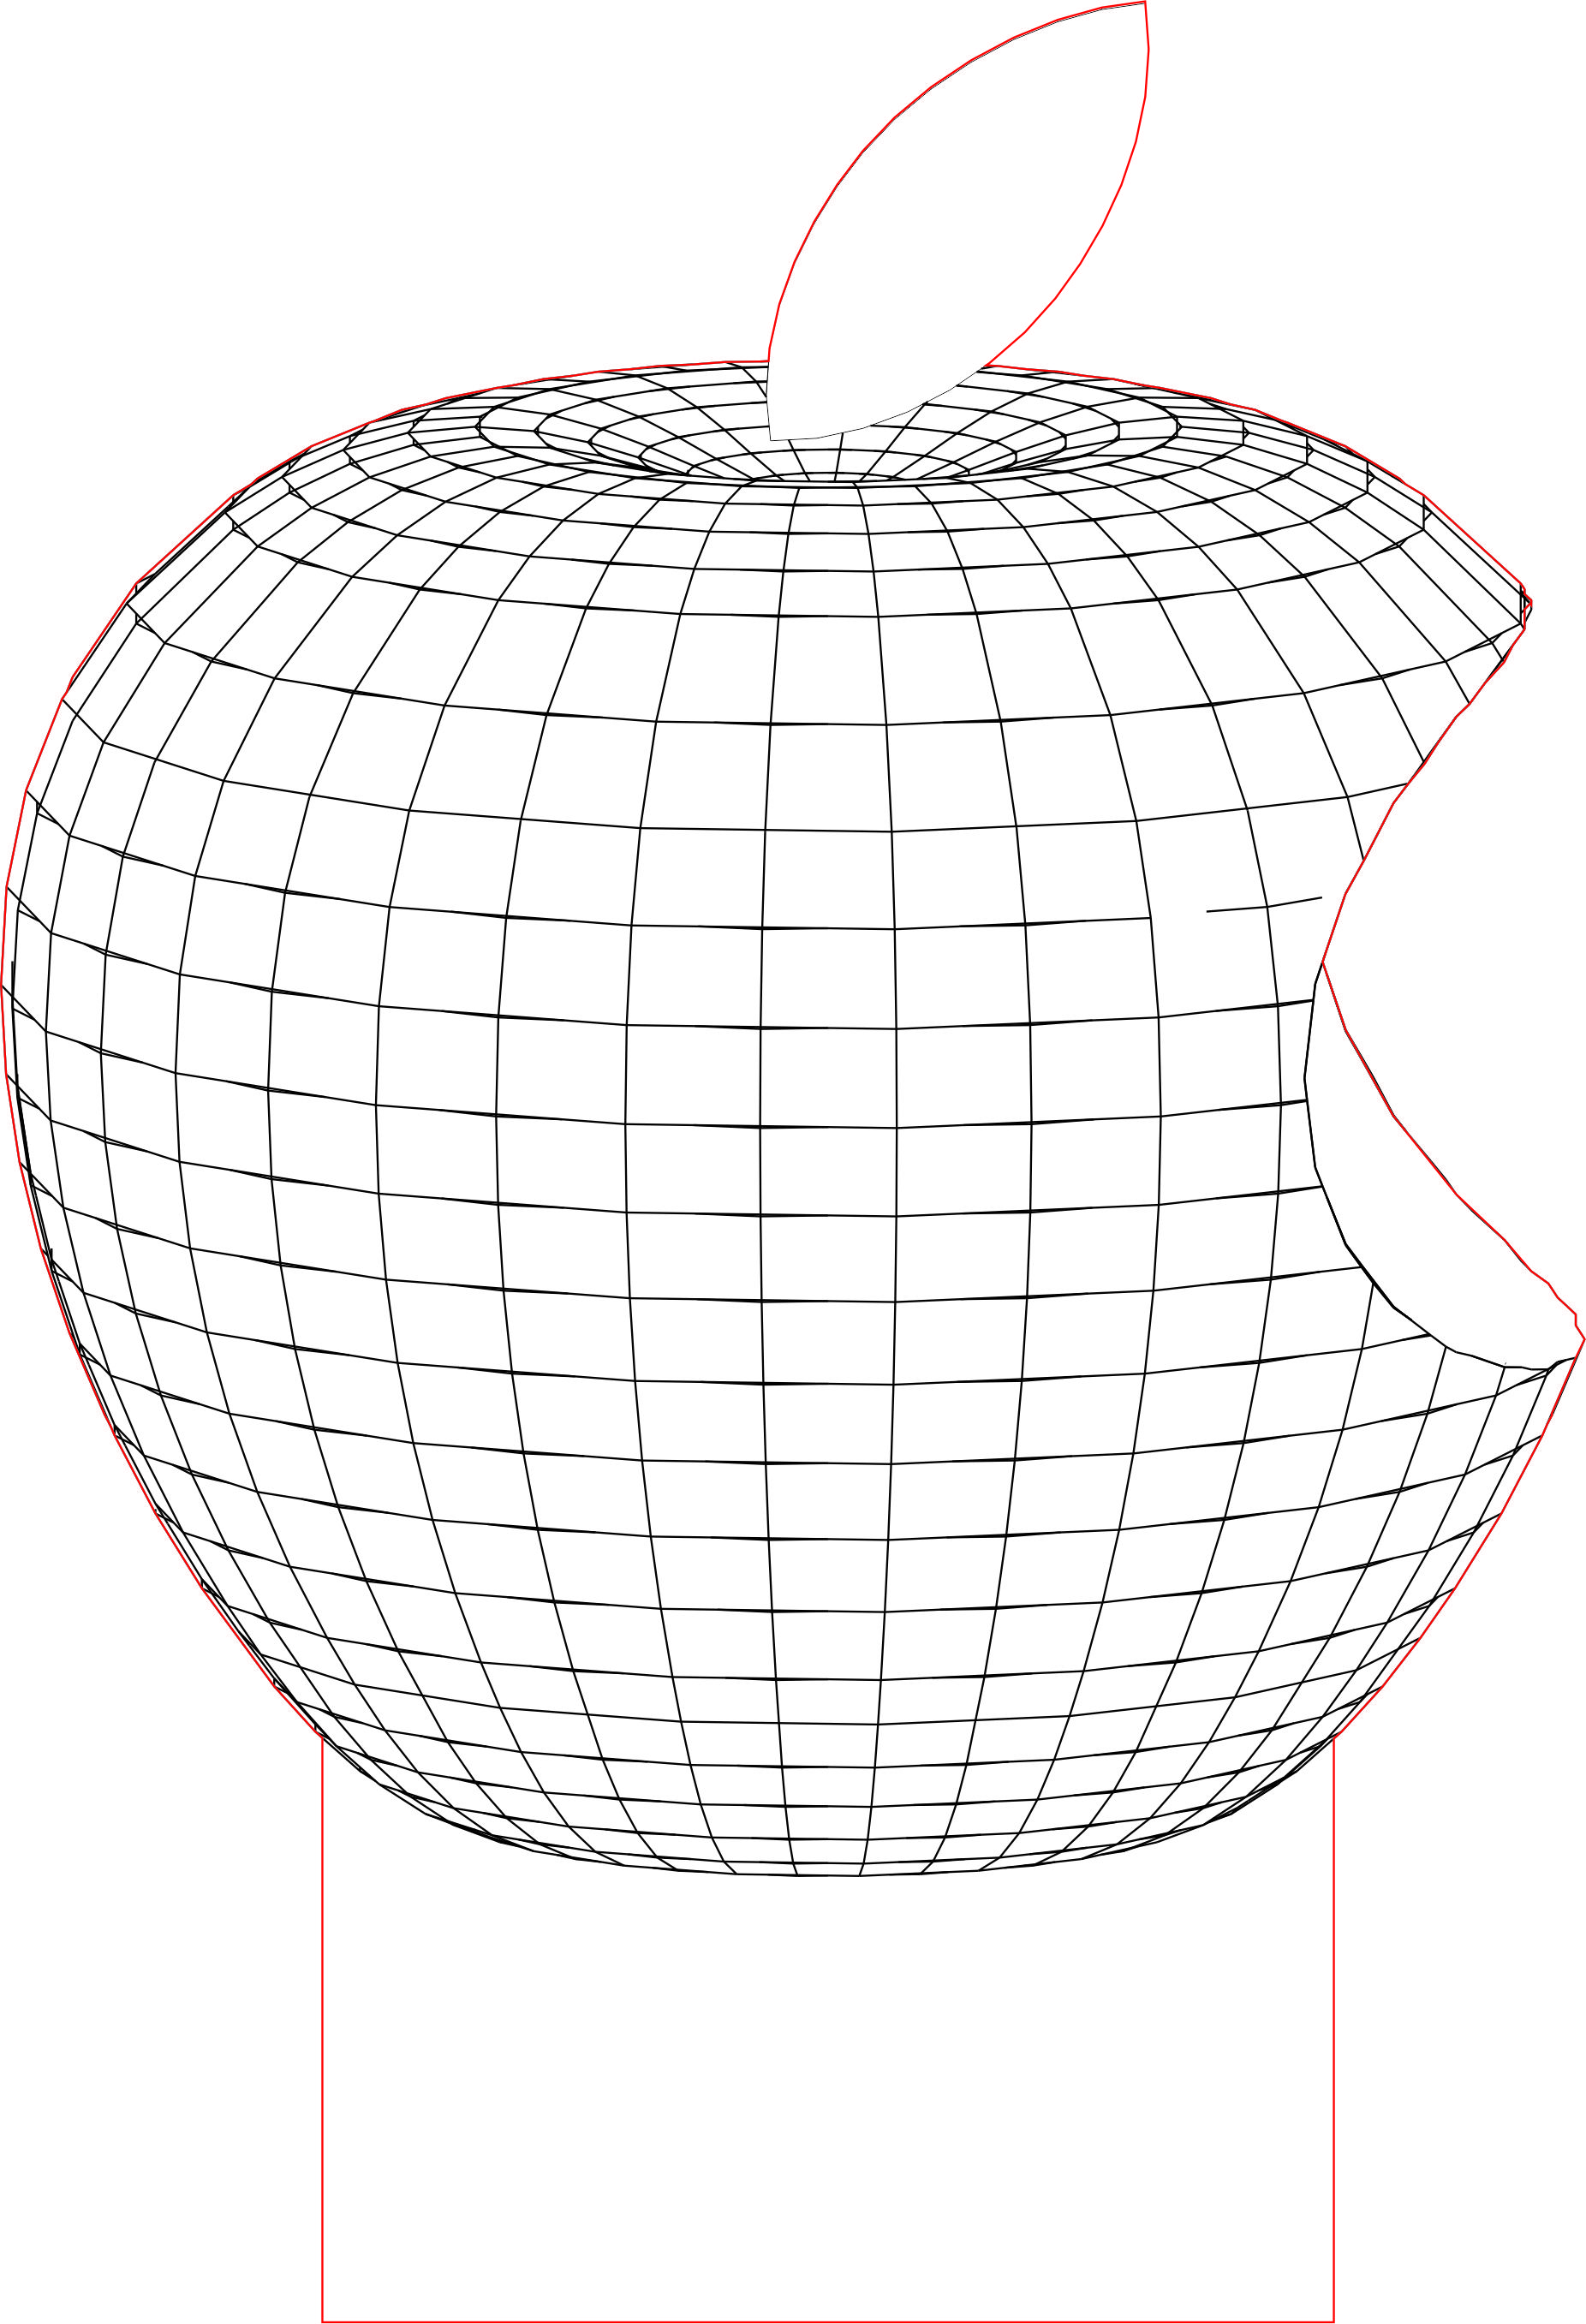 Logotype Apple 3d Illusion Led Lamp Vector File Line Art Design Plexus Products Lasercut Design